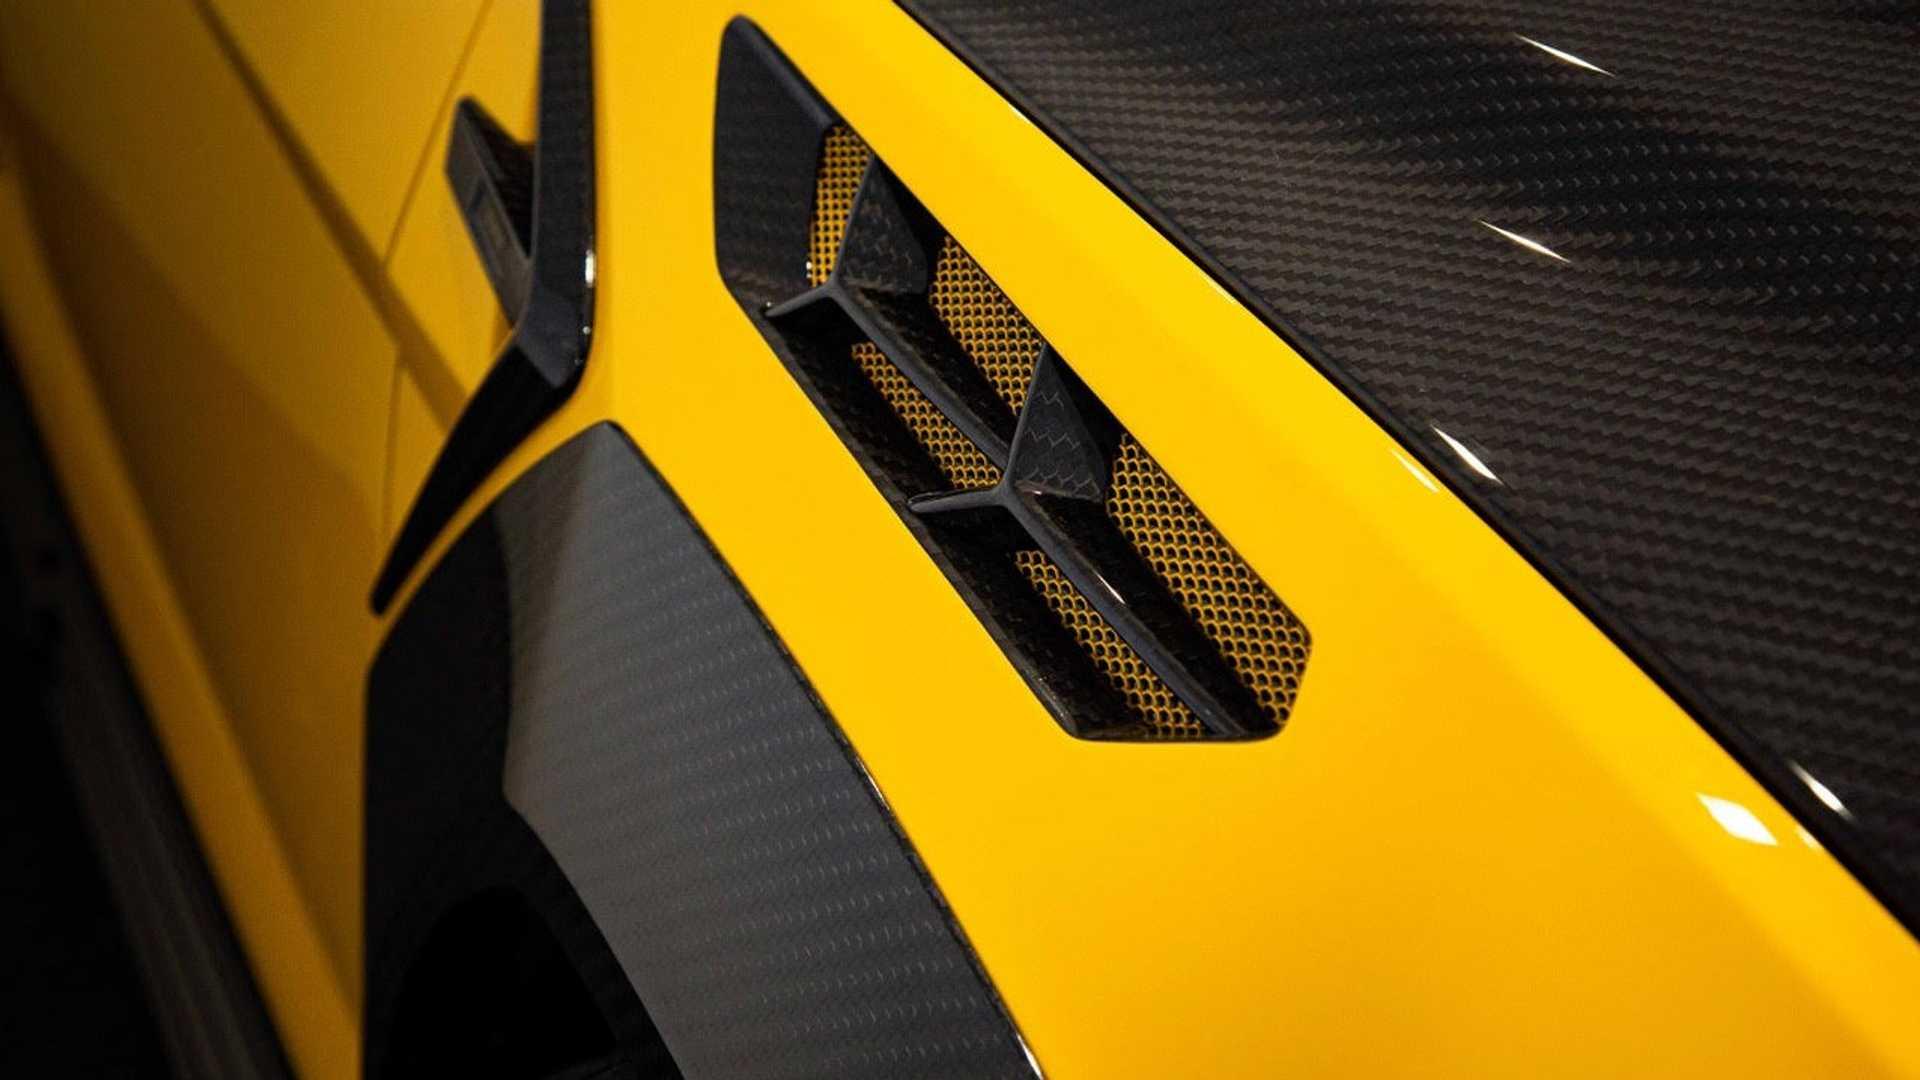 Lamborghini-Urus-by-Keyvany-11